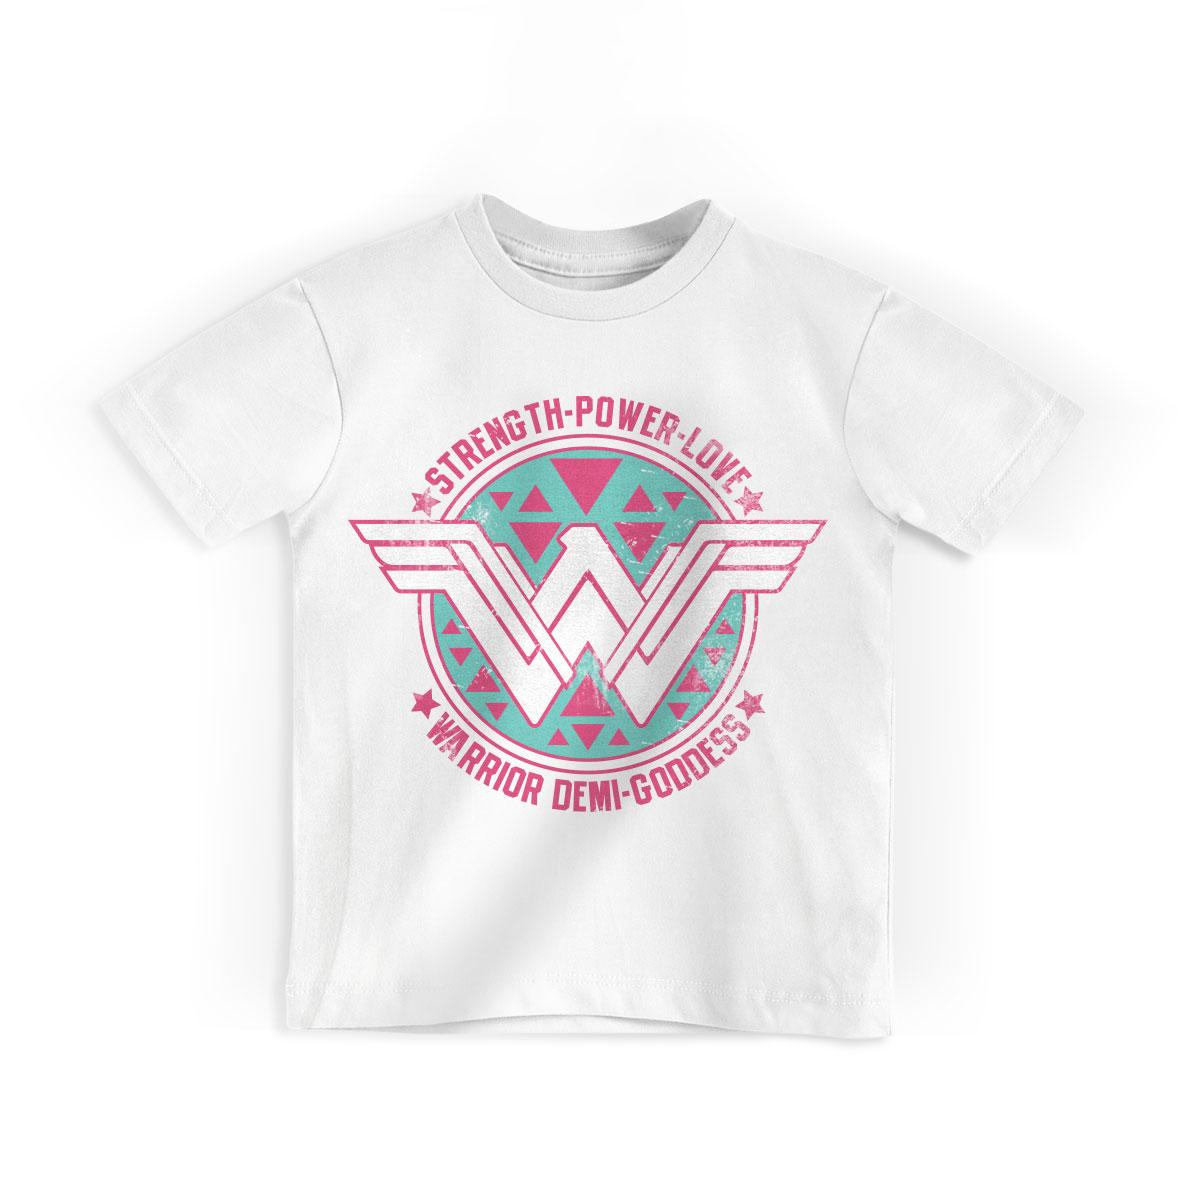 Camiseta Infantil Wonder Woman Warrior Demi-Goddess